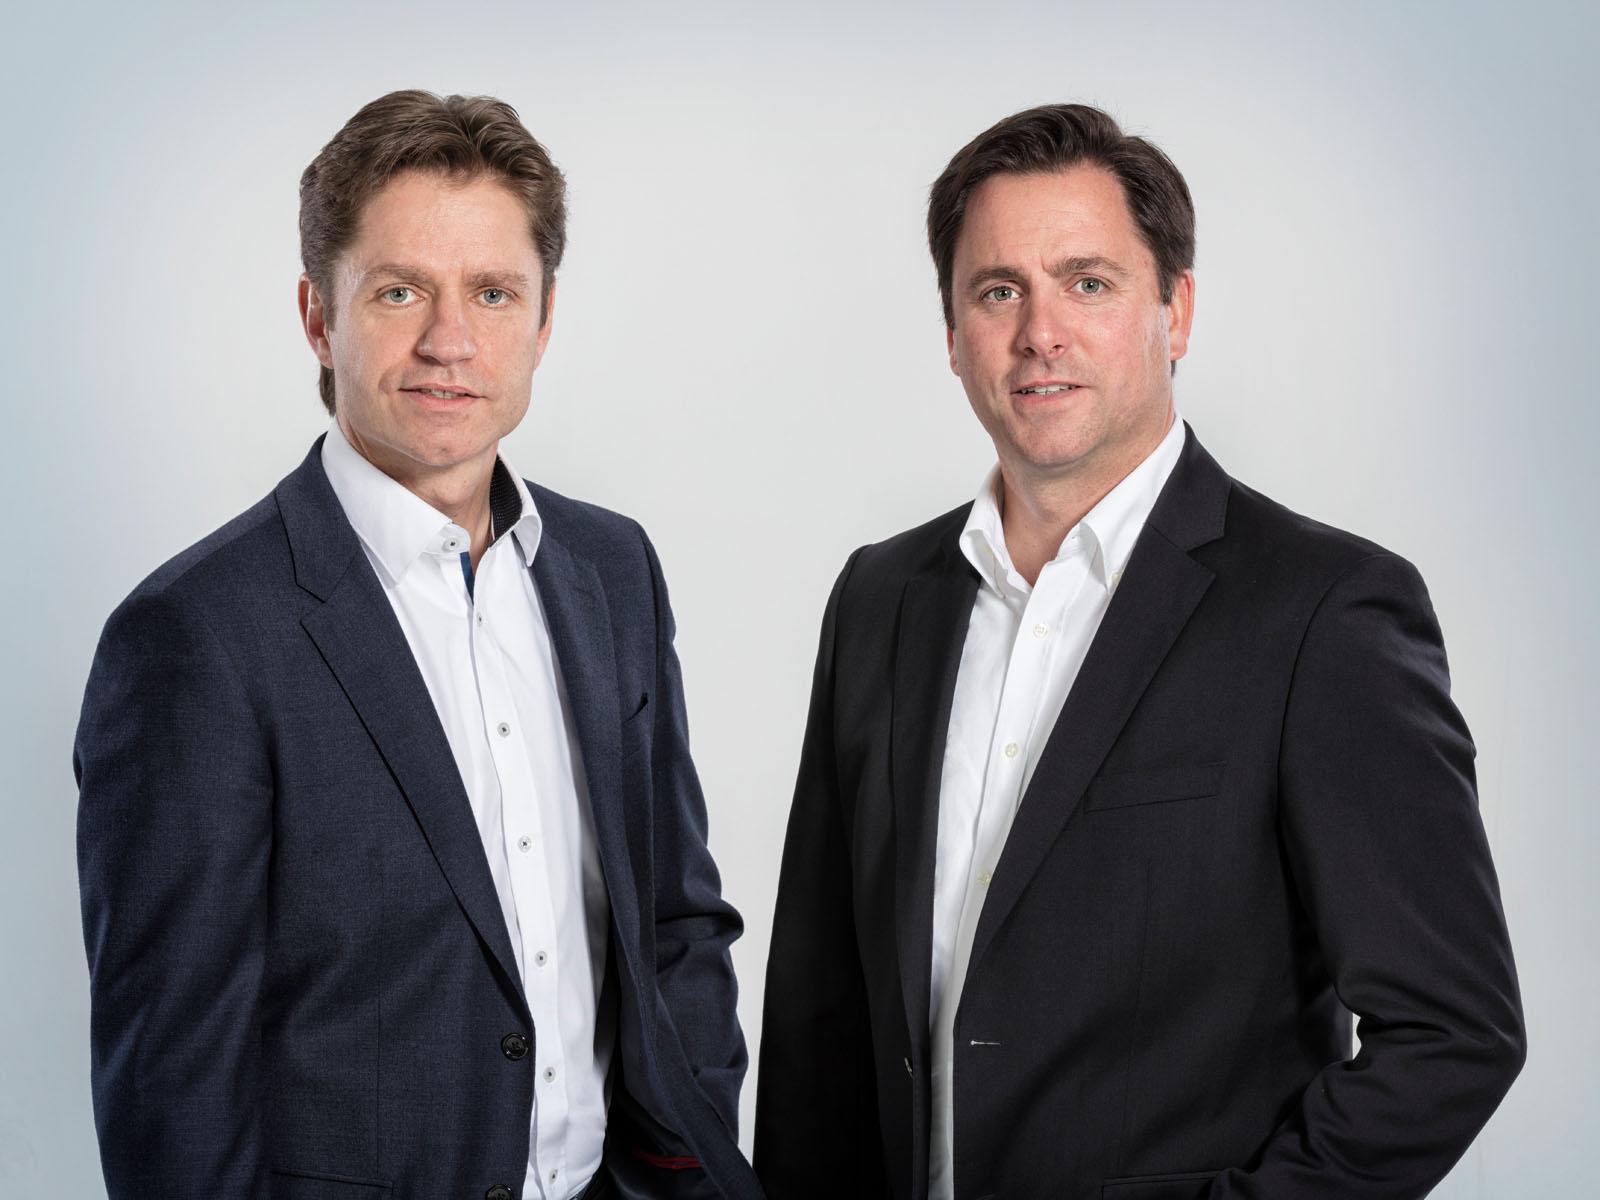 Dominic et Michel White